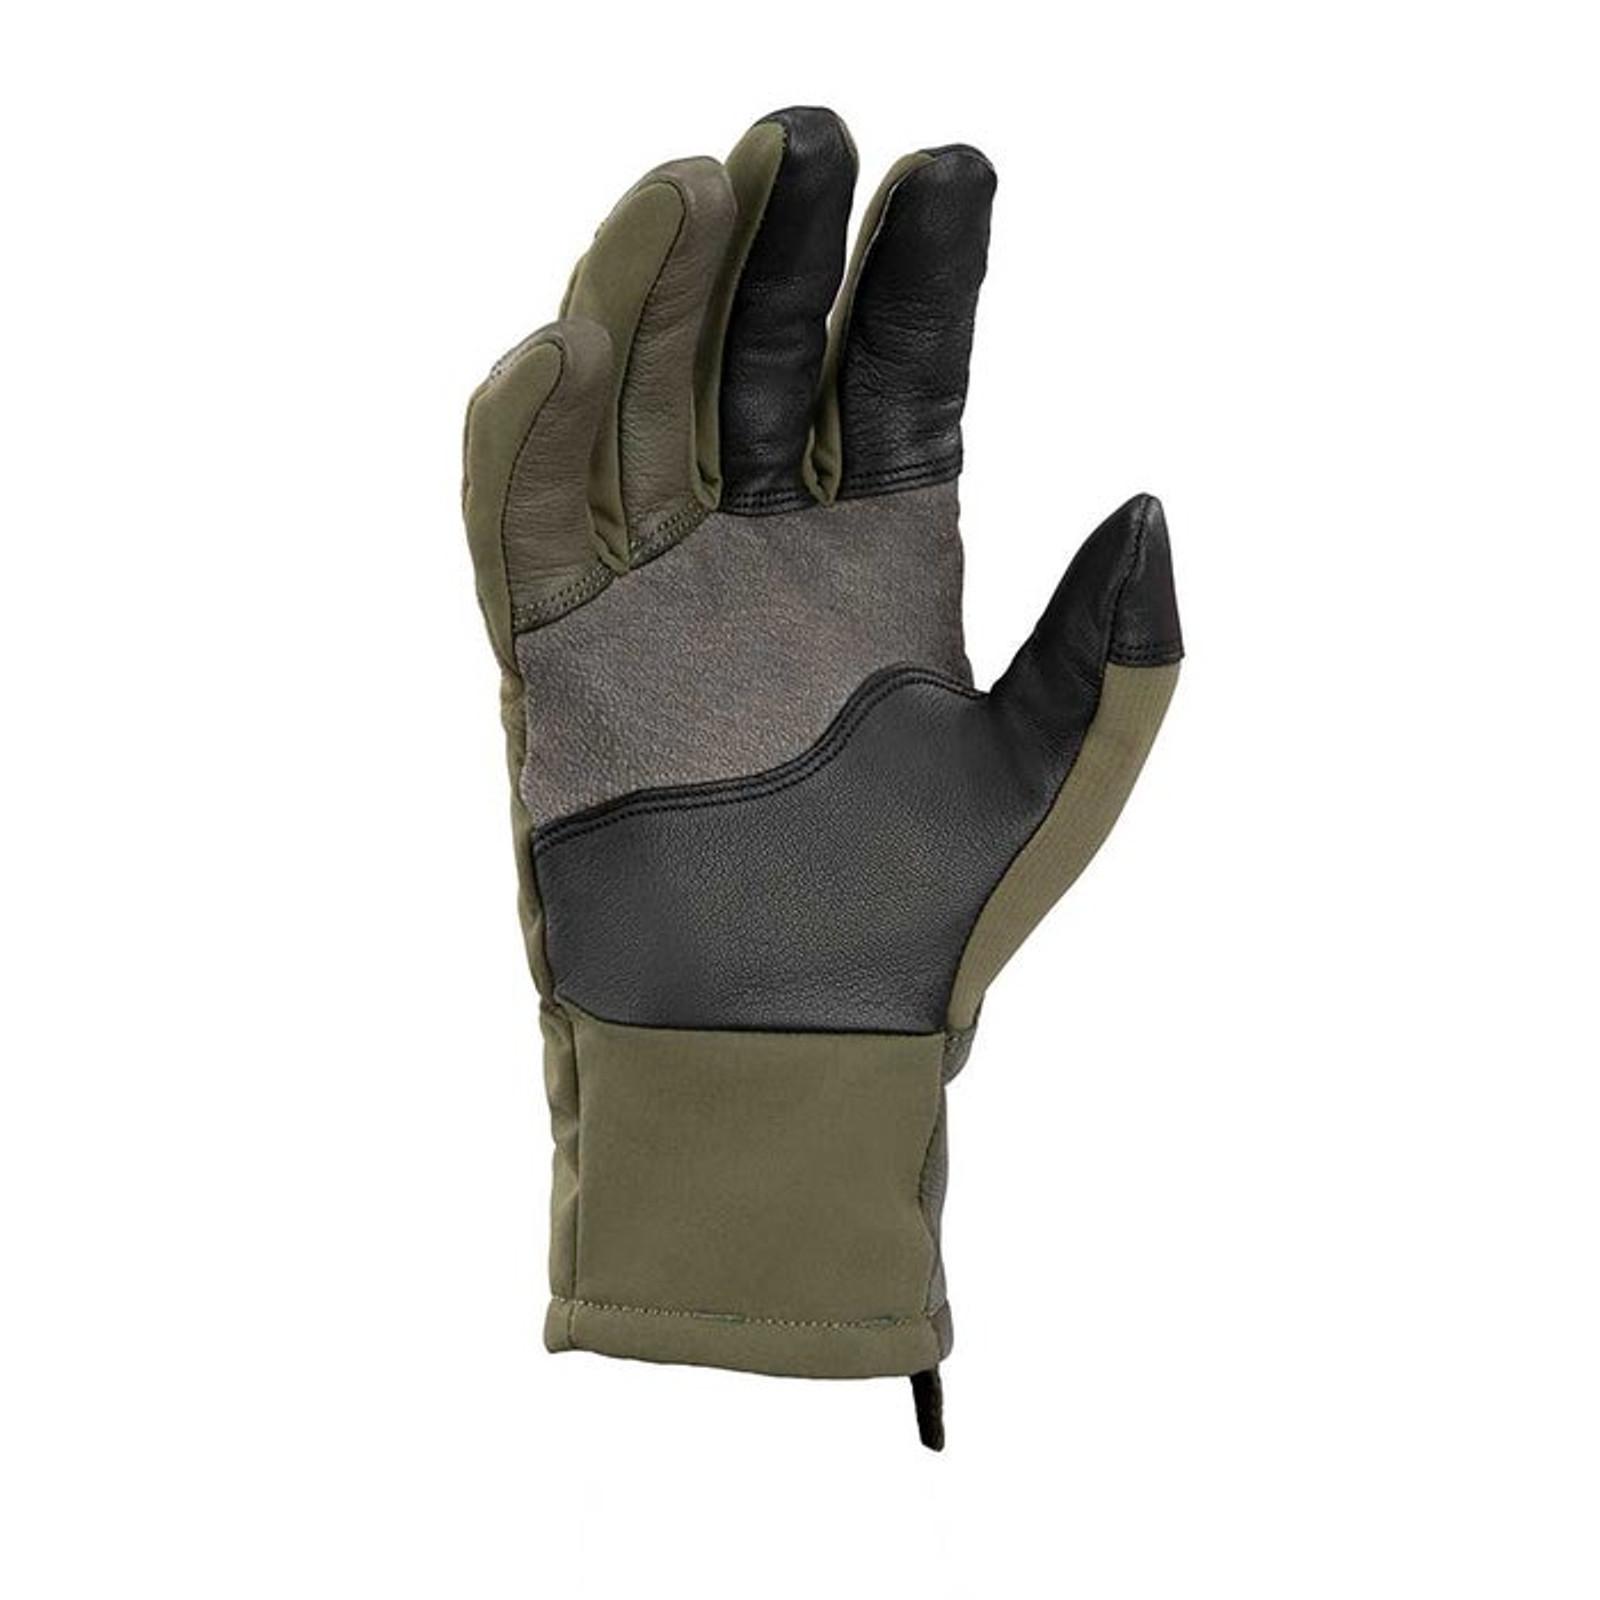 Crisp Action Glove - Vertx